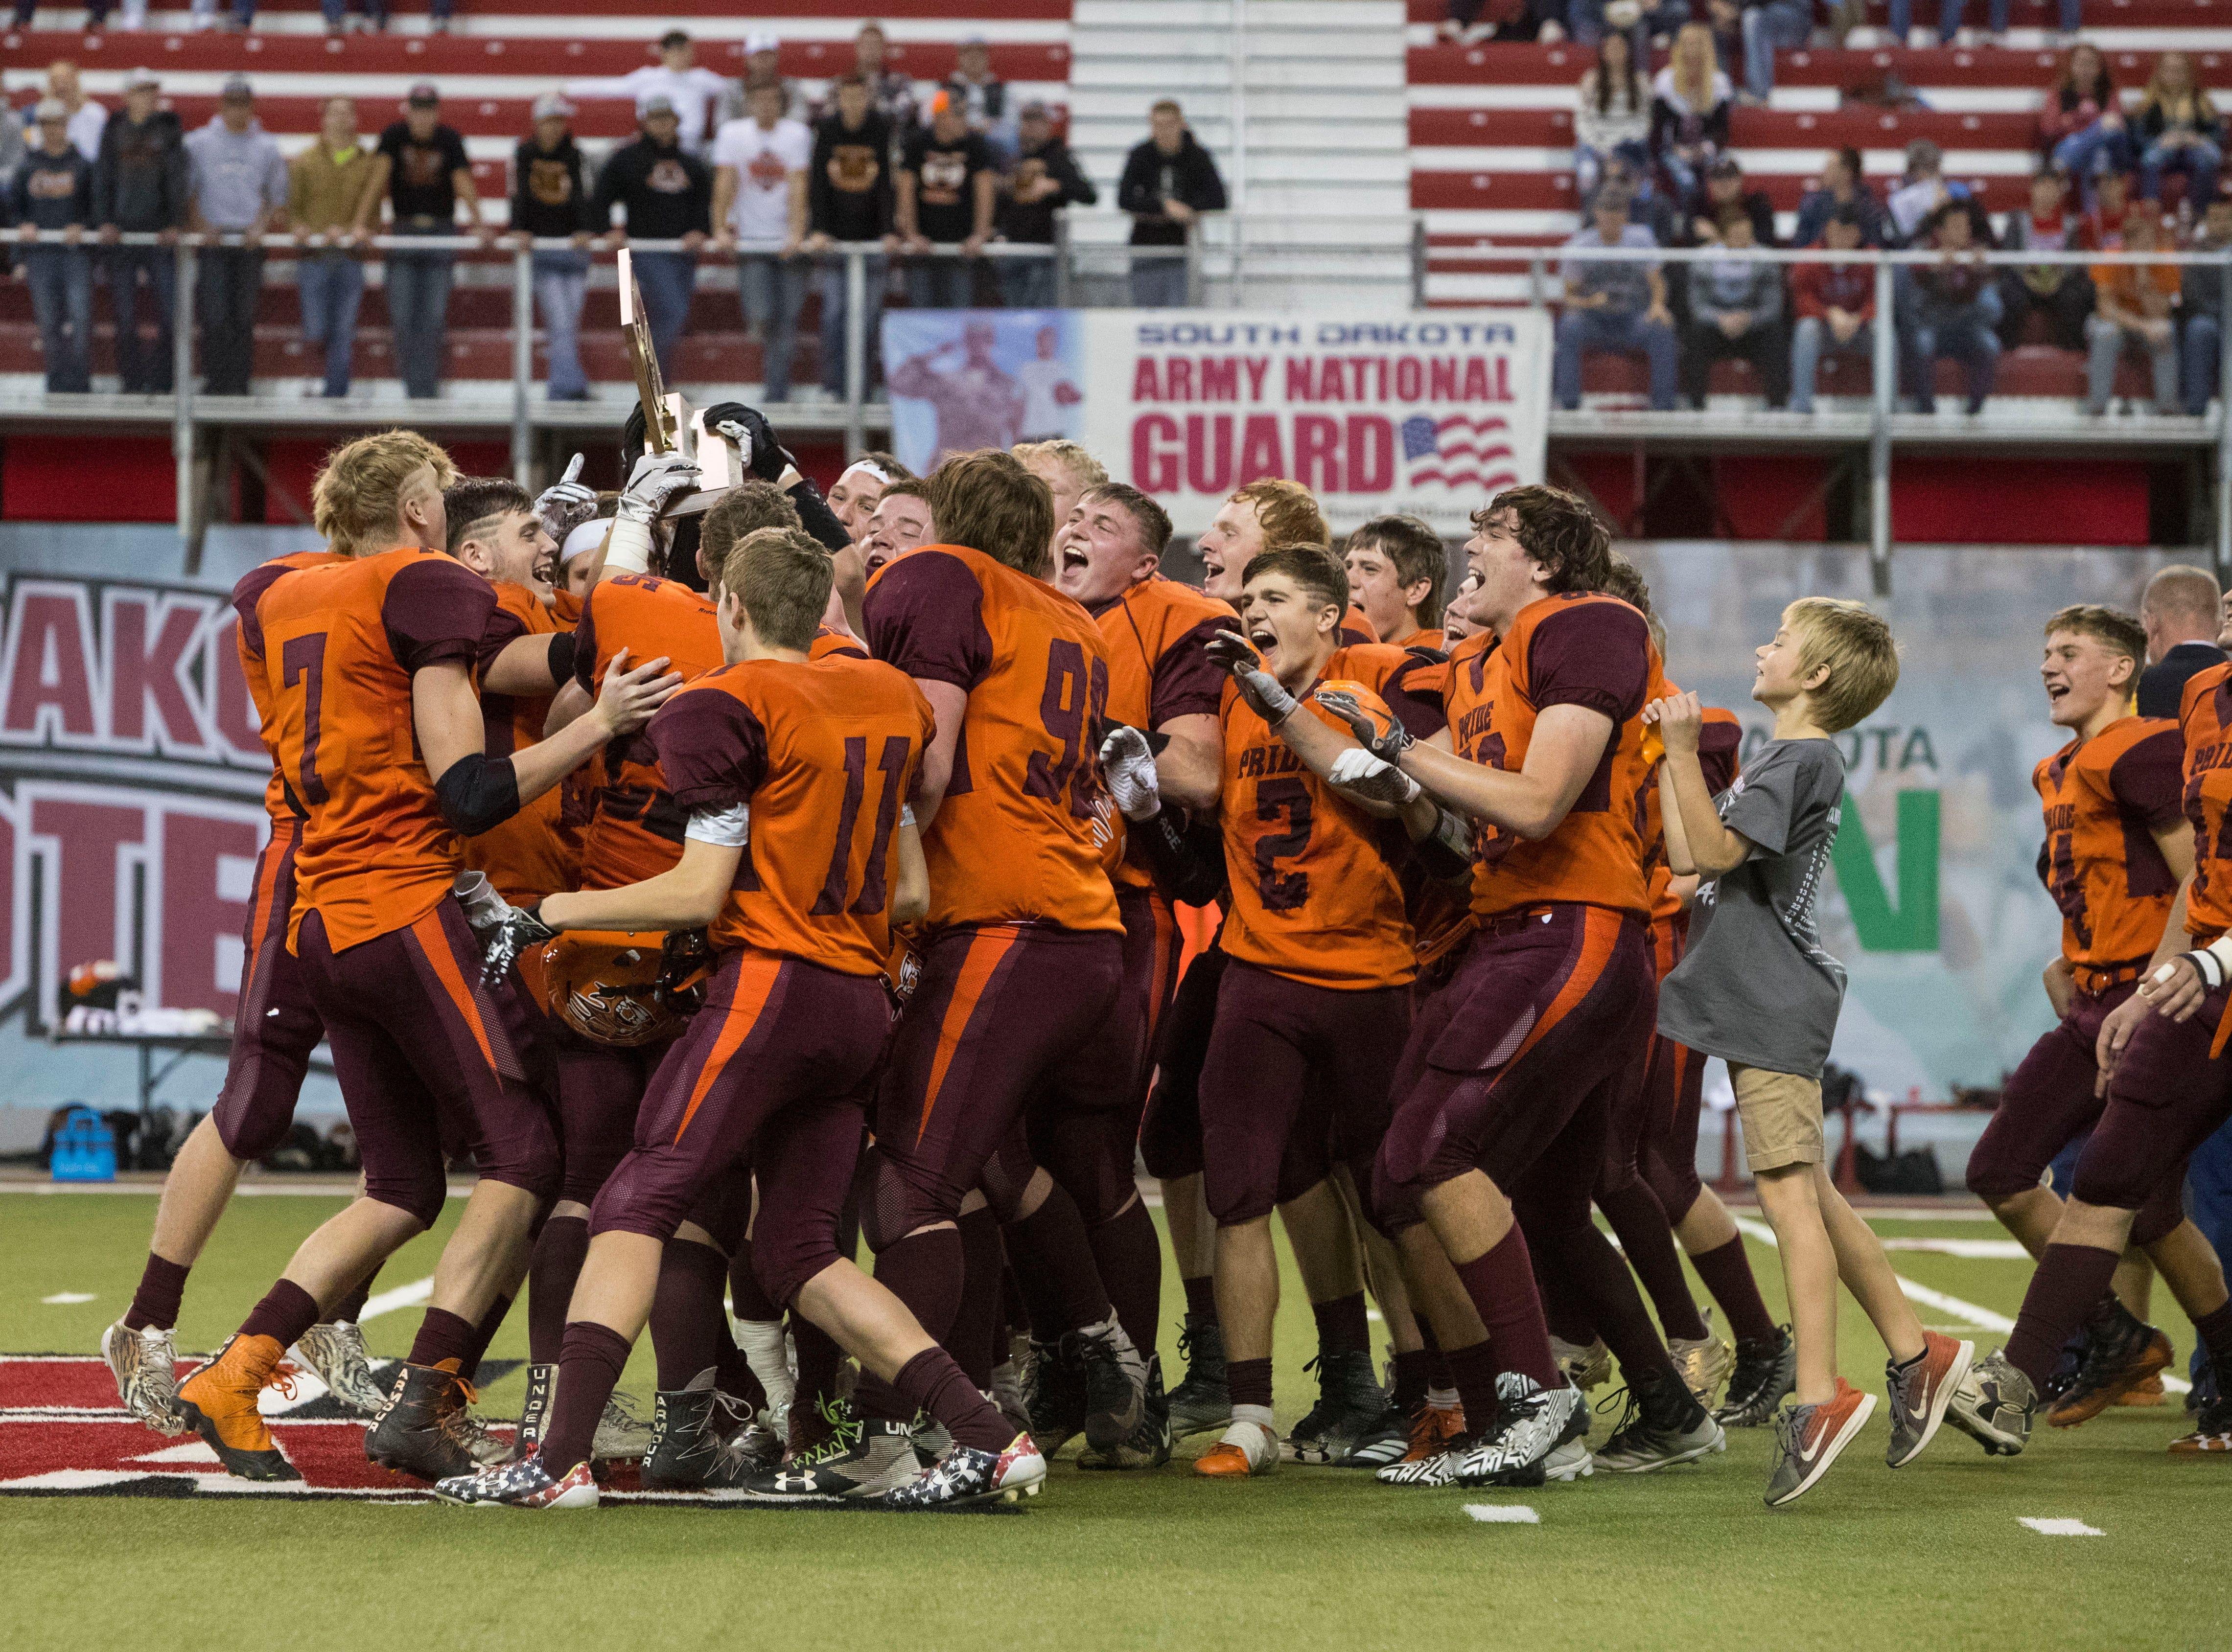 Canistota/Freeman team celebrates after winning the class 9A high school football championship, Thursday, Nov. 8, 2018 at the DakotaDome in Vermillion, S.D.